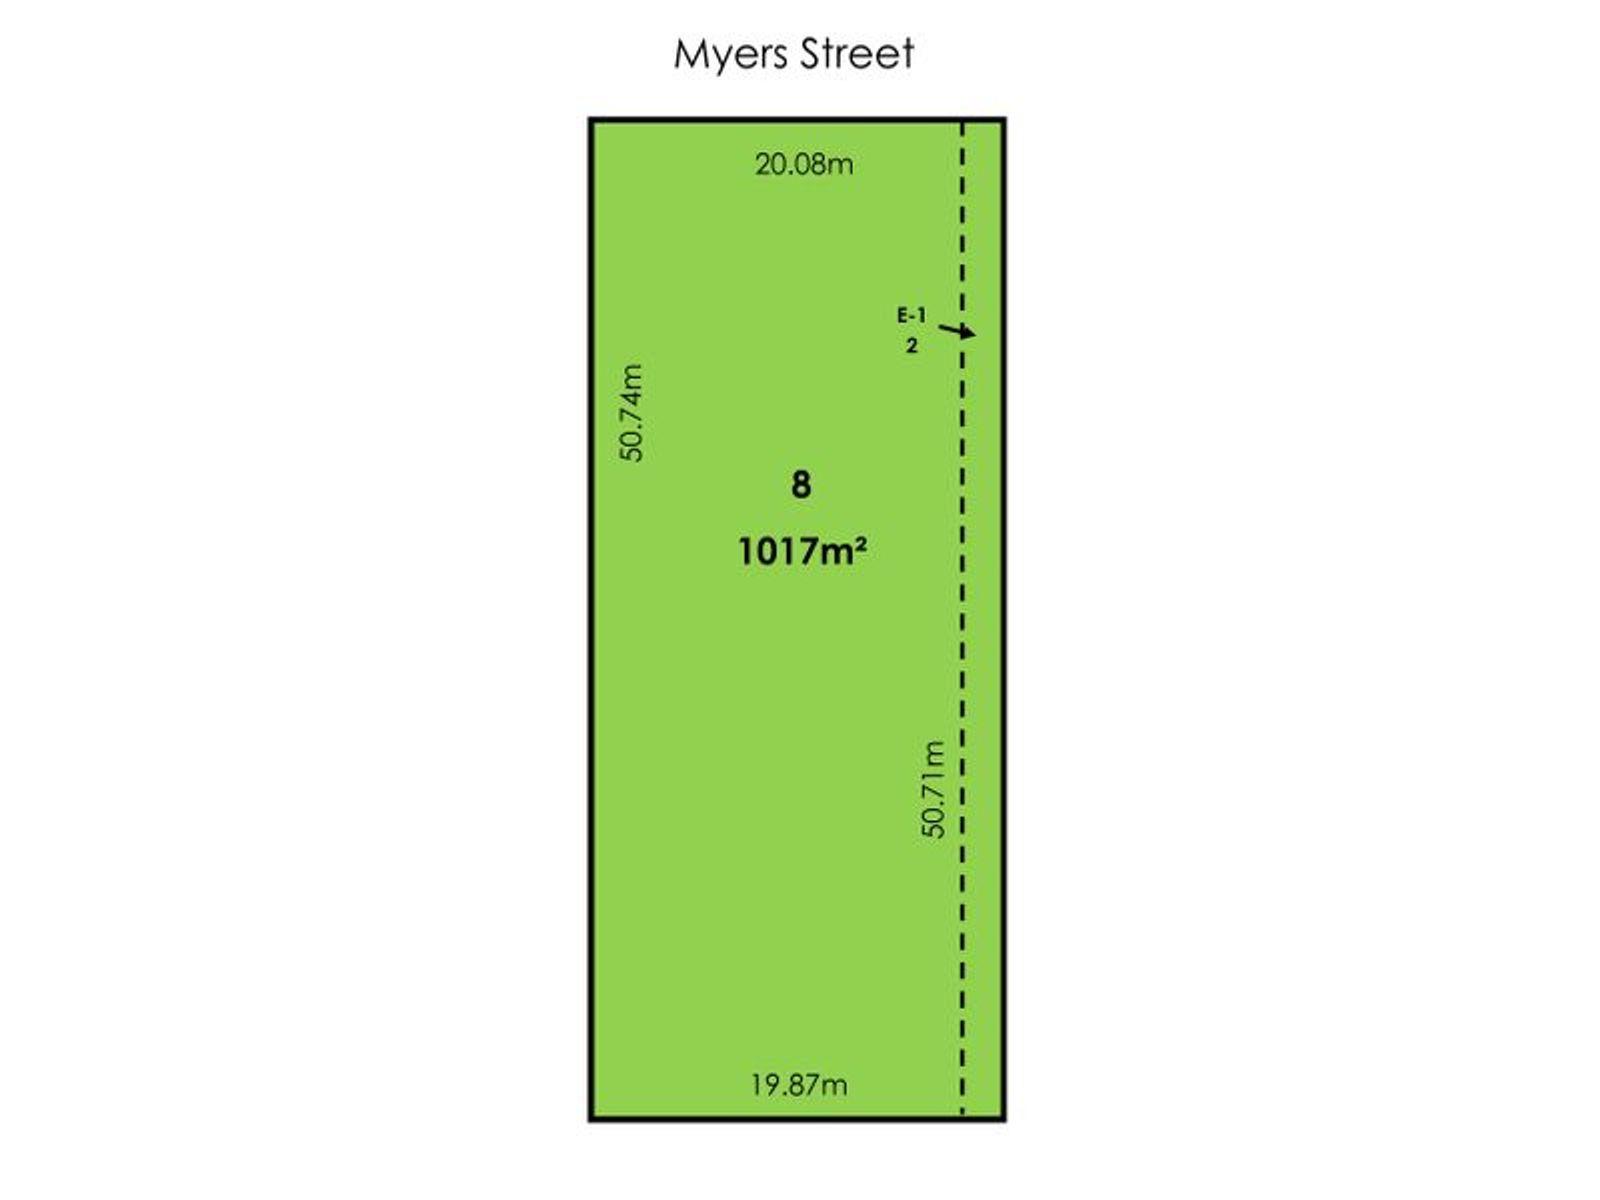 32 Myers Street, Bendigo, VIC 3550